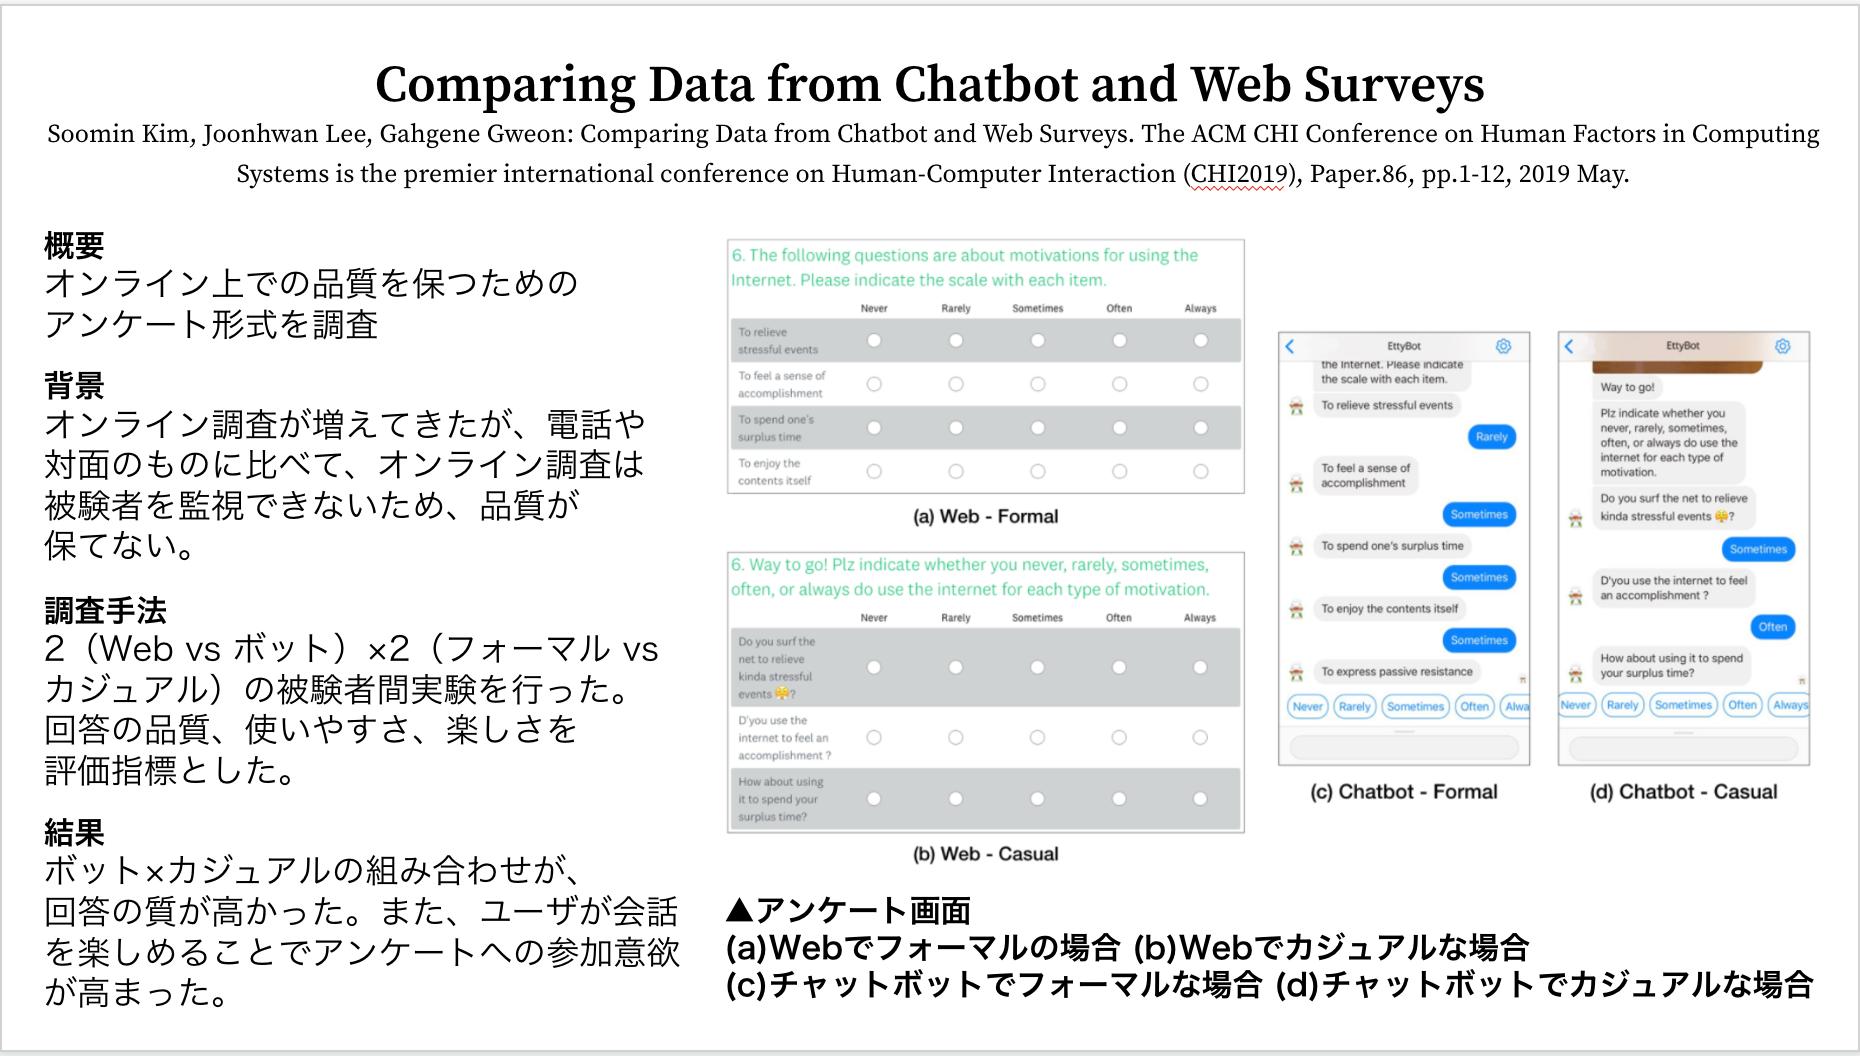 comparing_data_chatbot_web.png (604.5 kB)